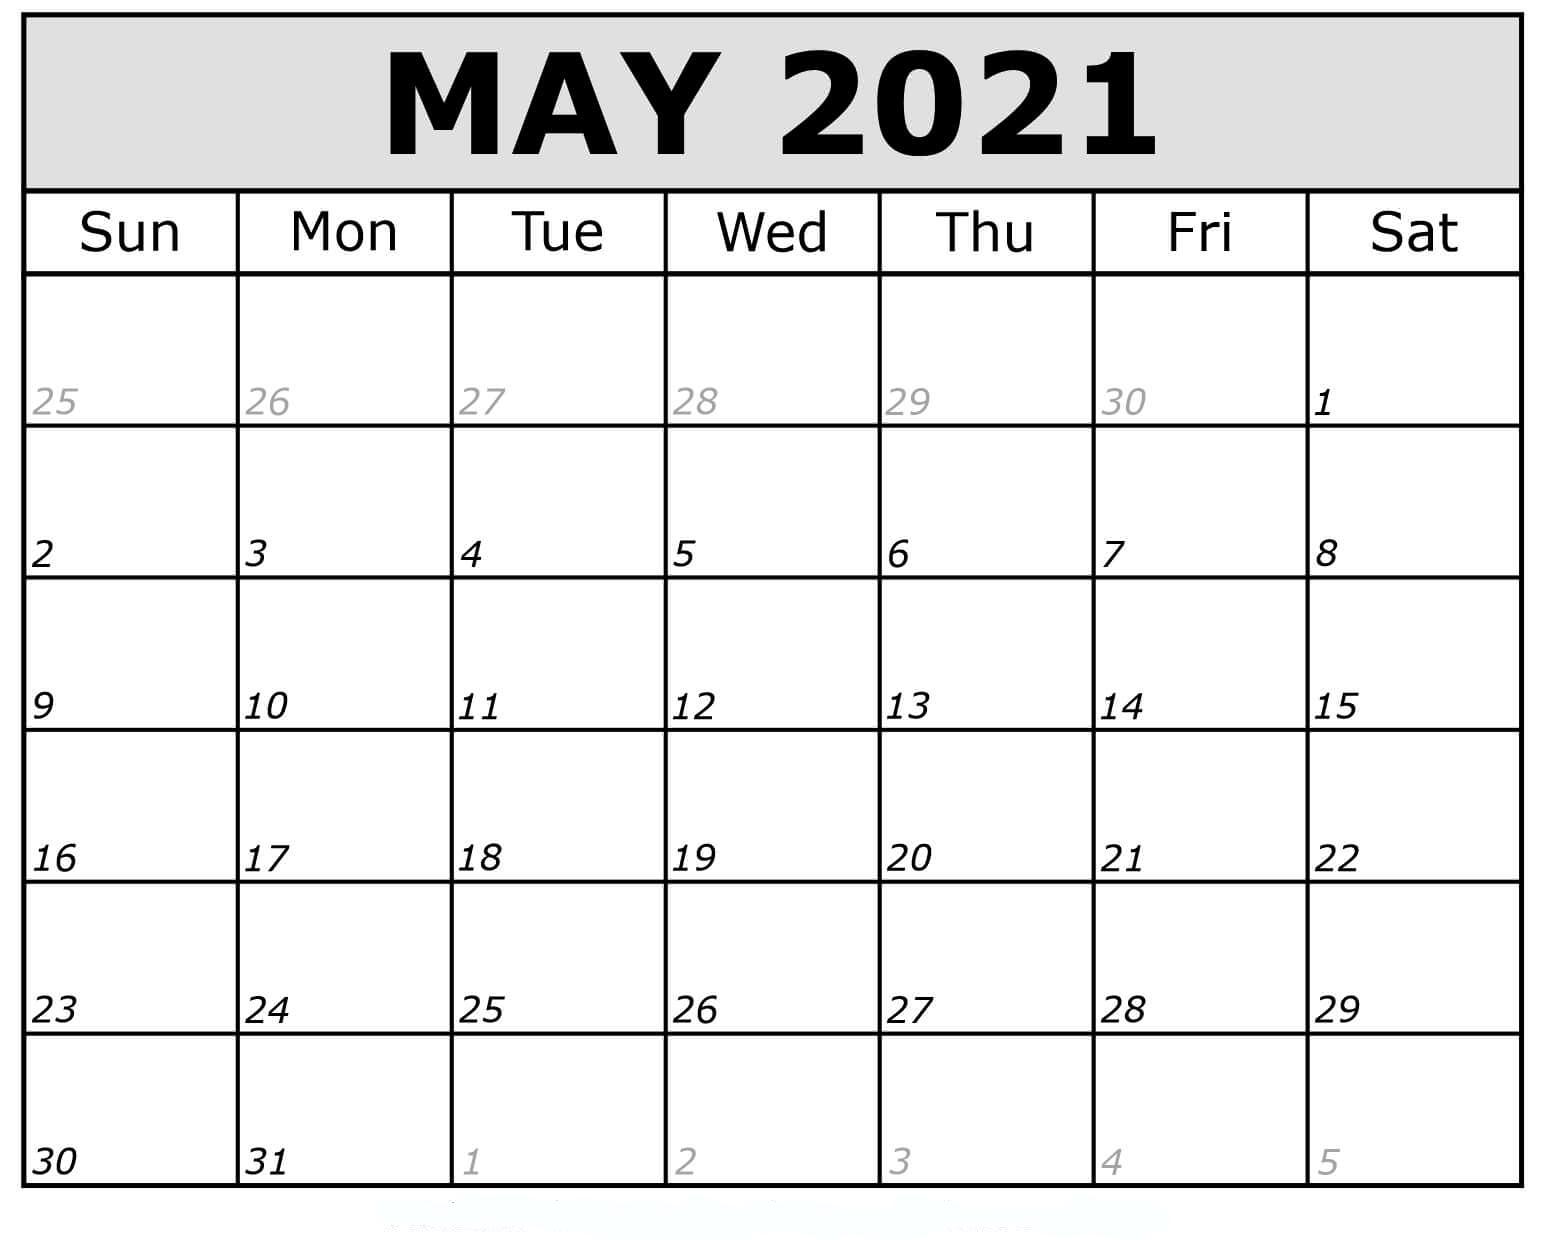 May 2021 Calendar Printable Pdf Mycalendarlabs 1